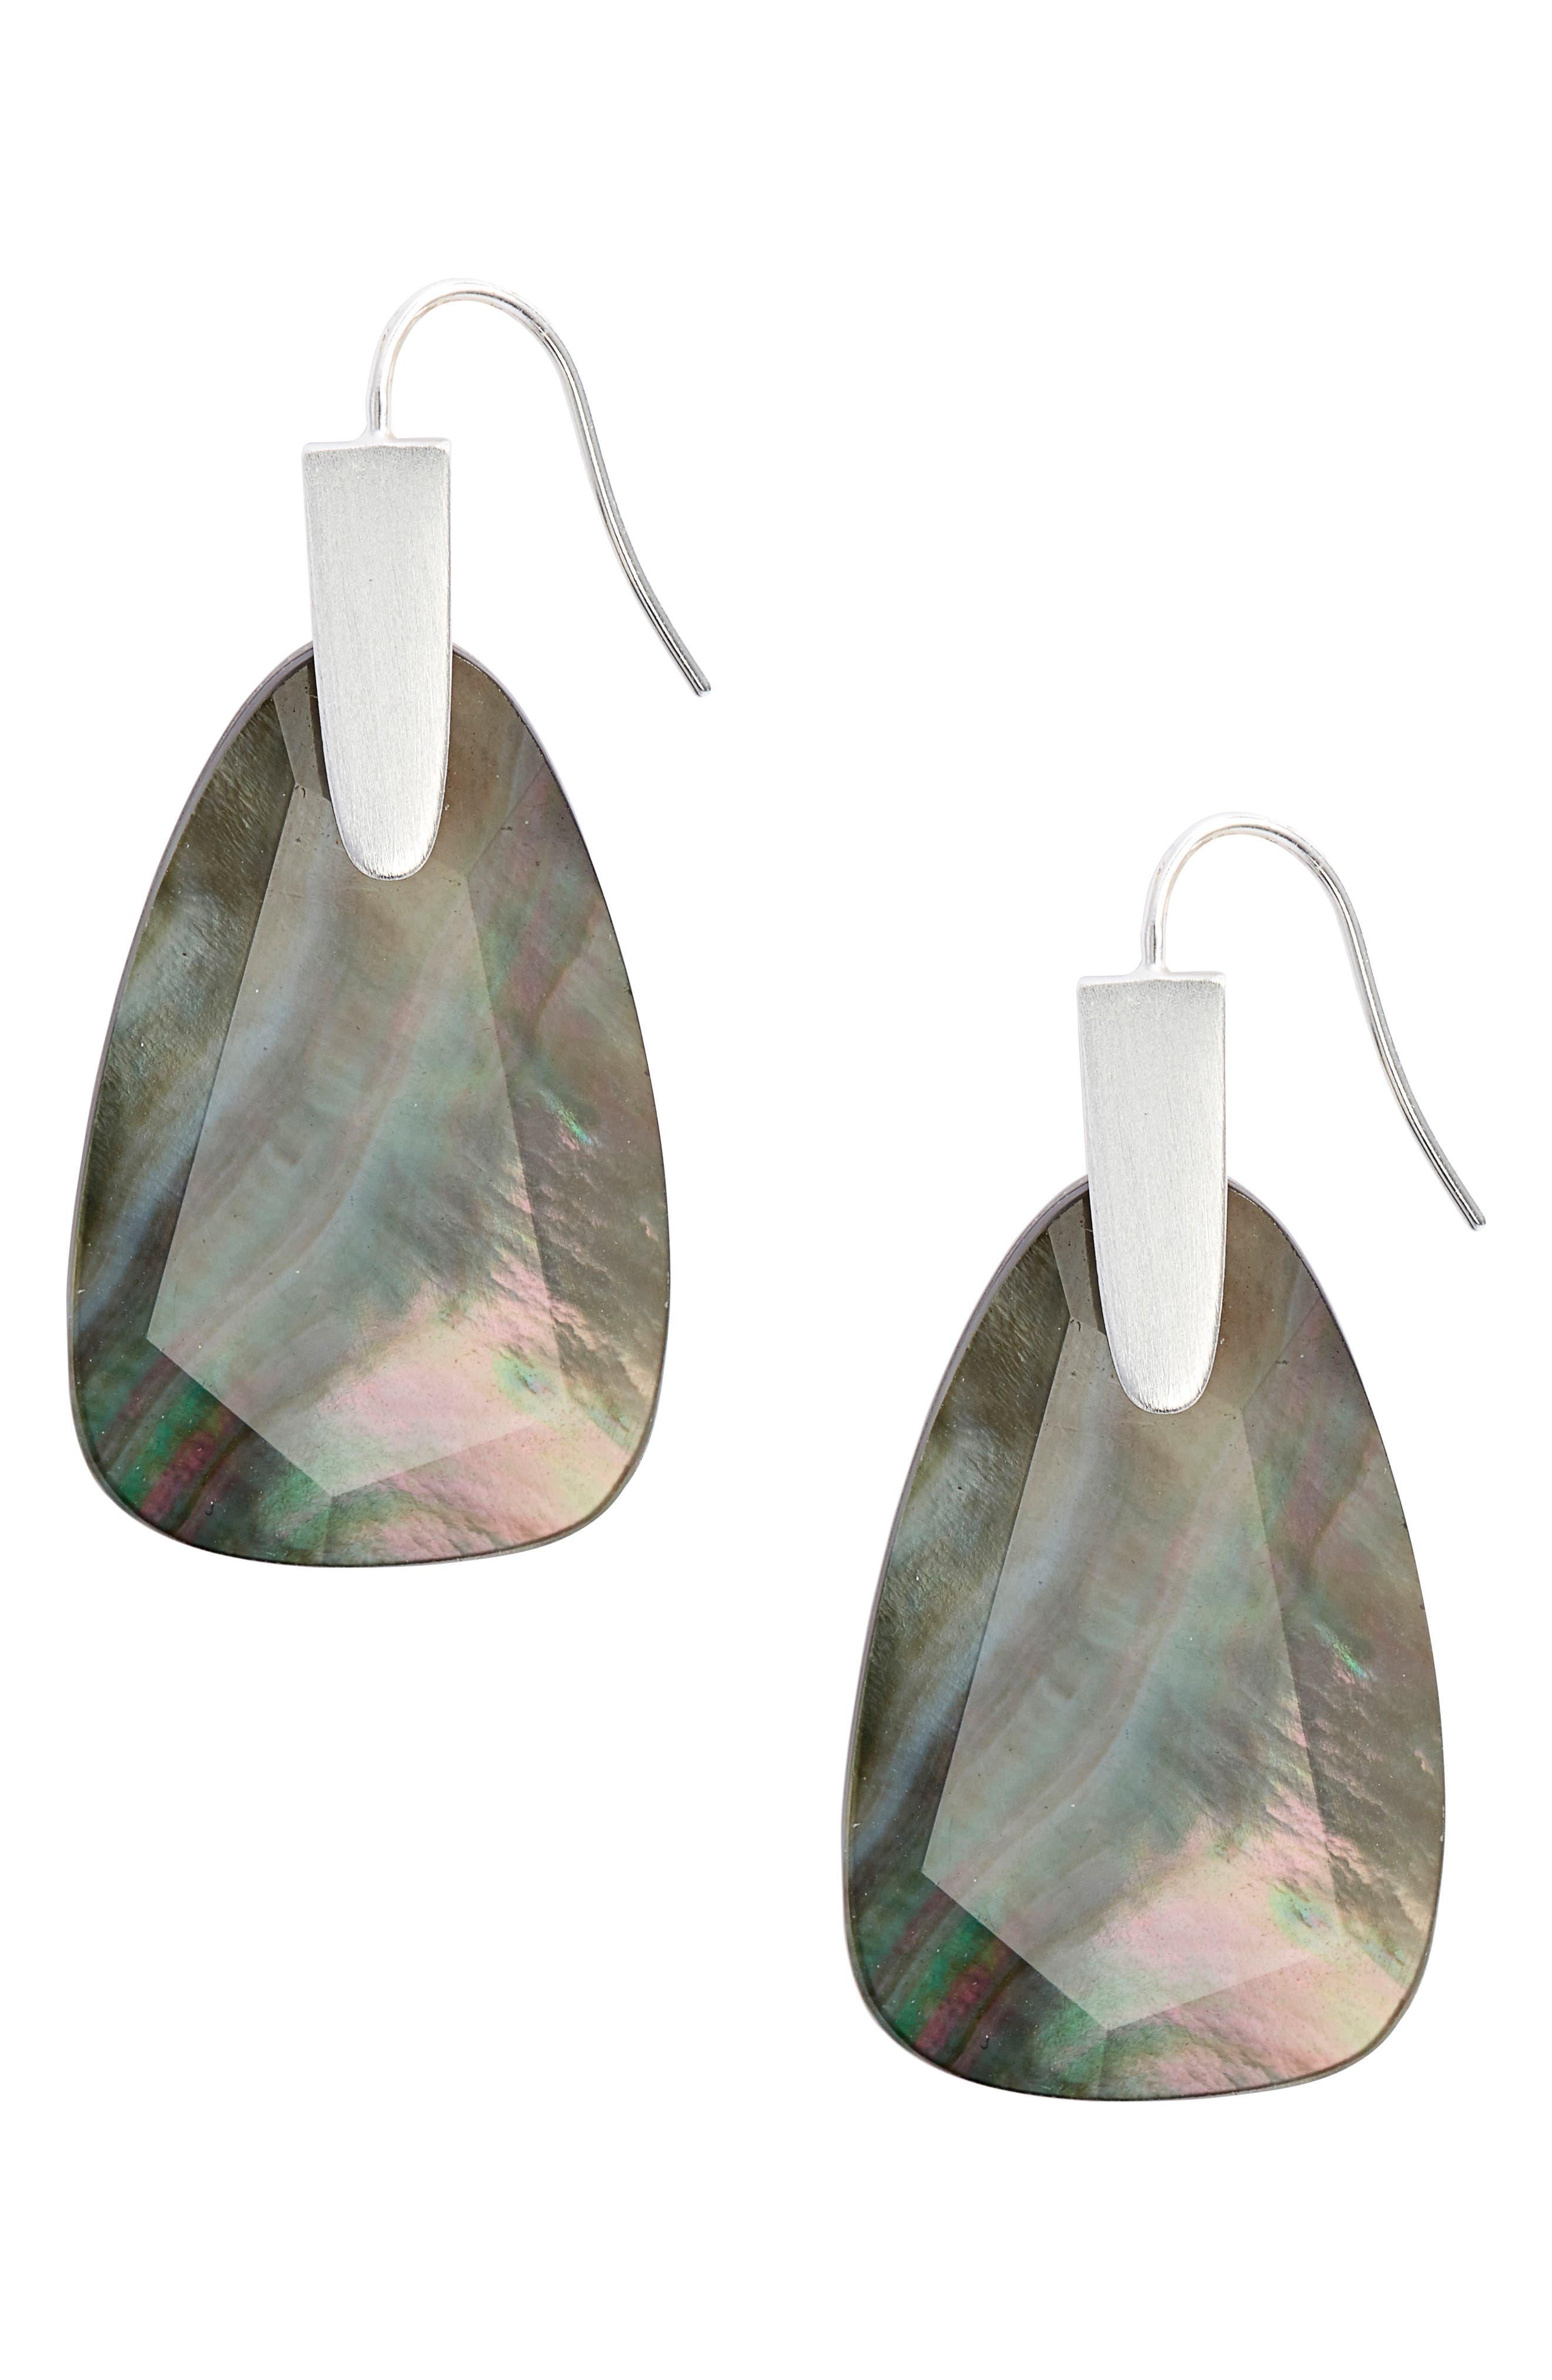 KENDRA SCOTT Marty Drop Earrings, Main, color, BRIGHT SILVER/ BLACK MOP